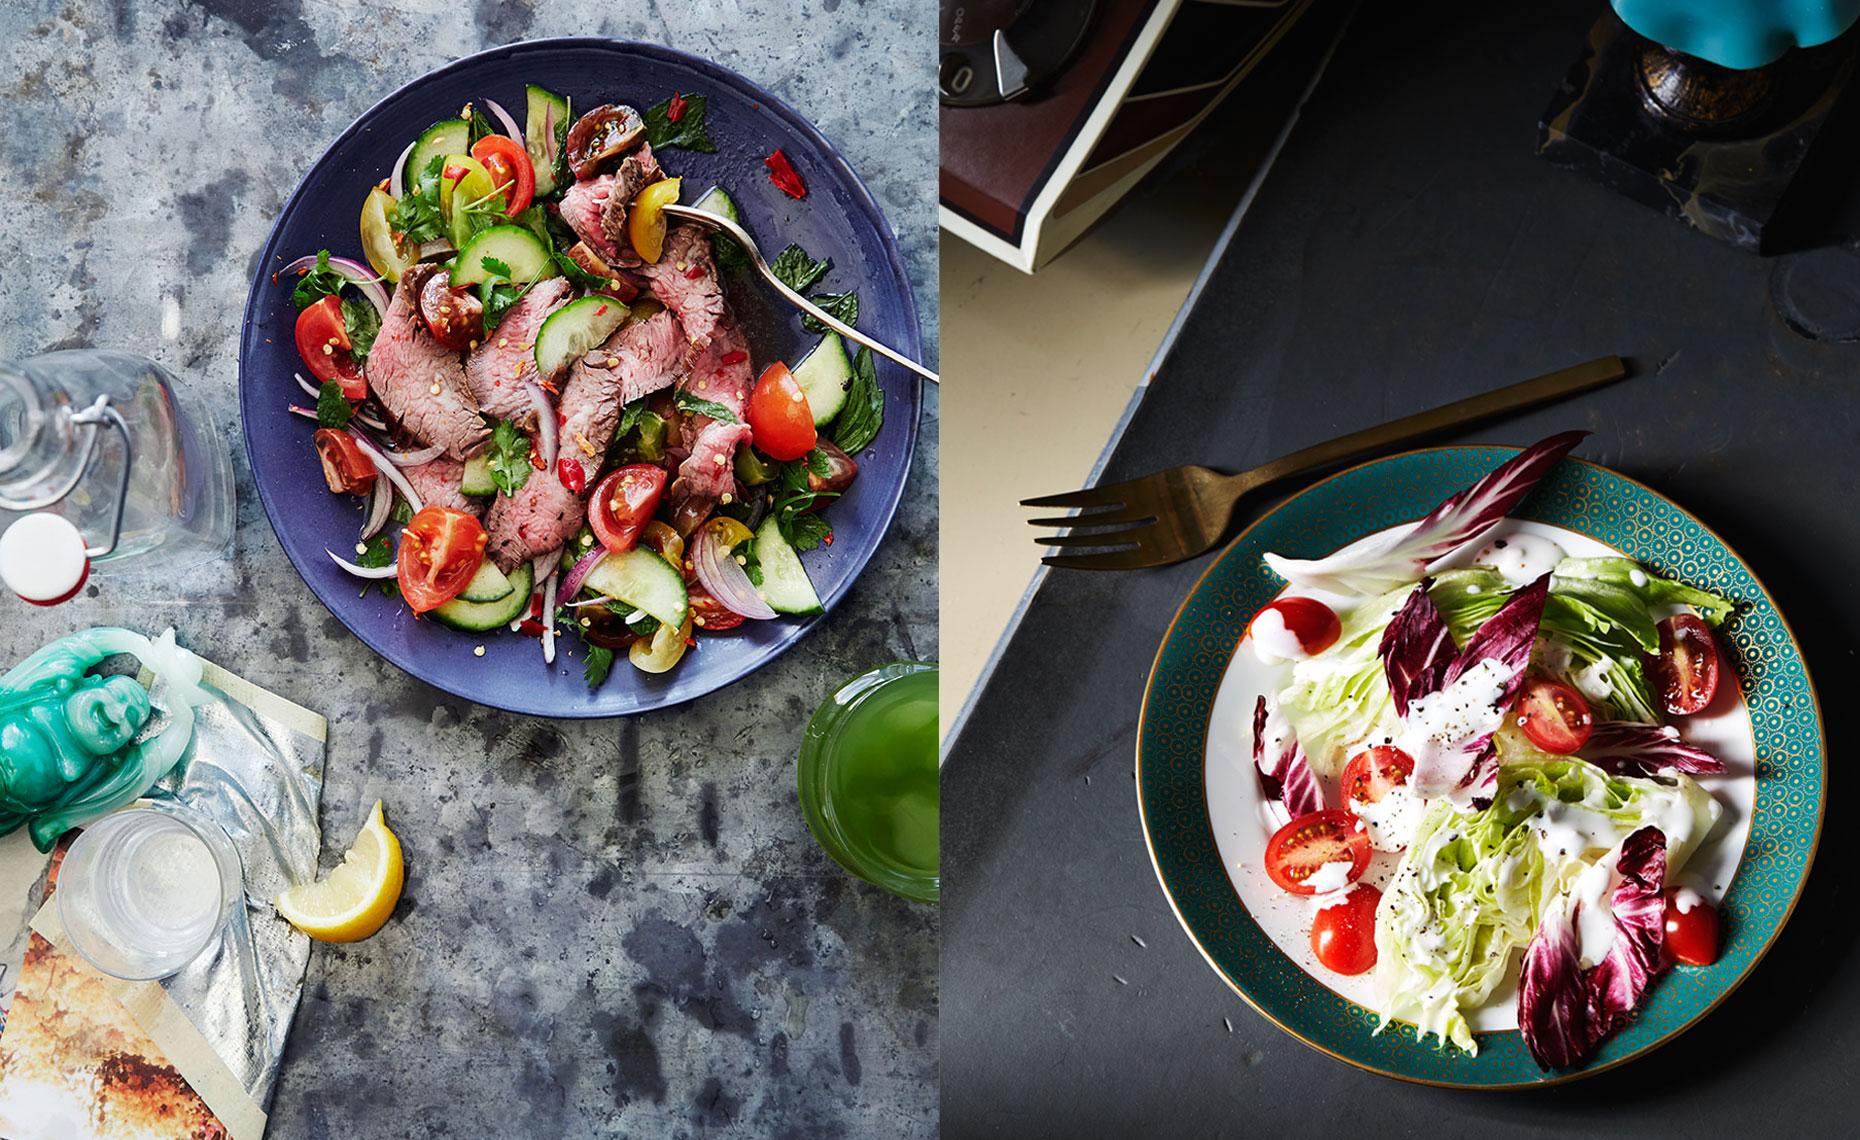 beef-salad-and-iceberg-salad.jpg